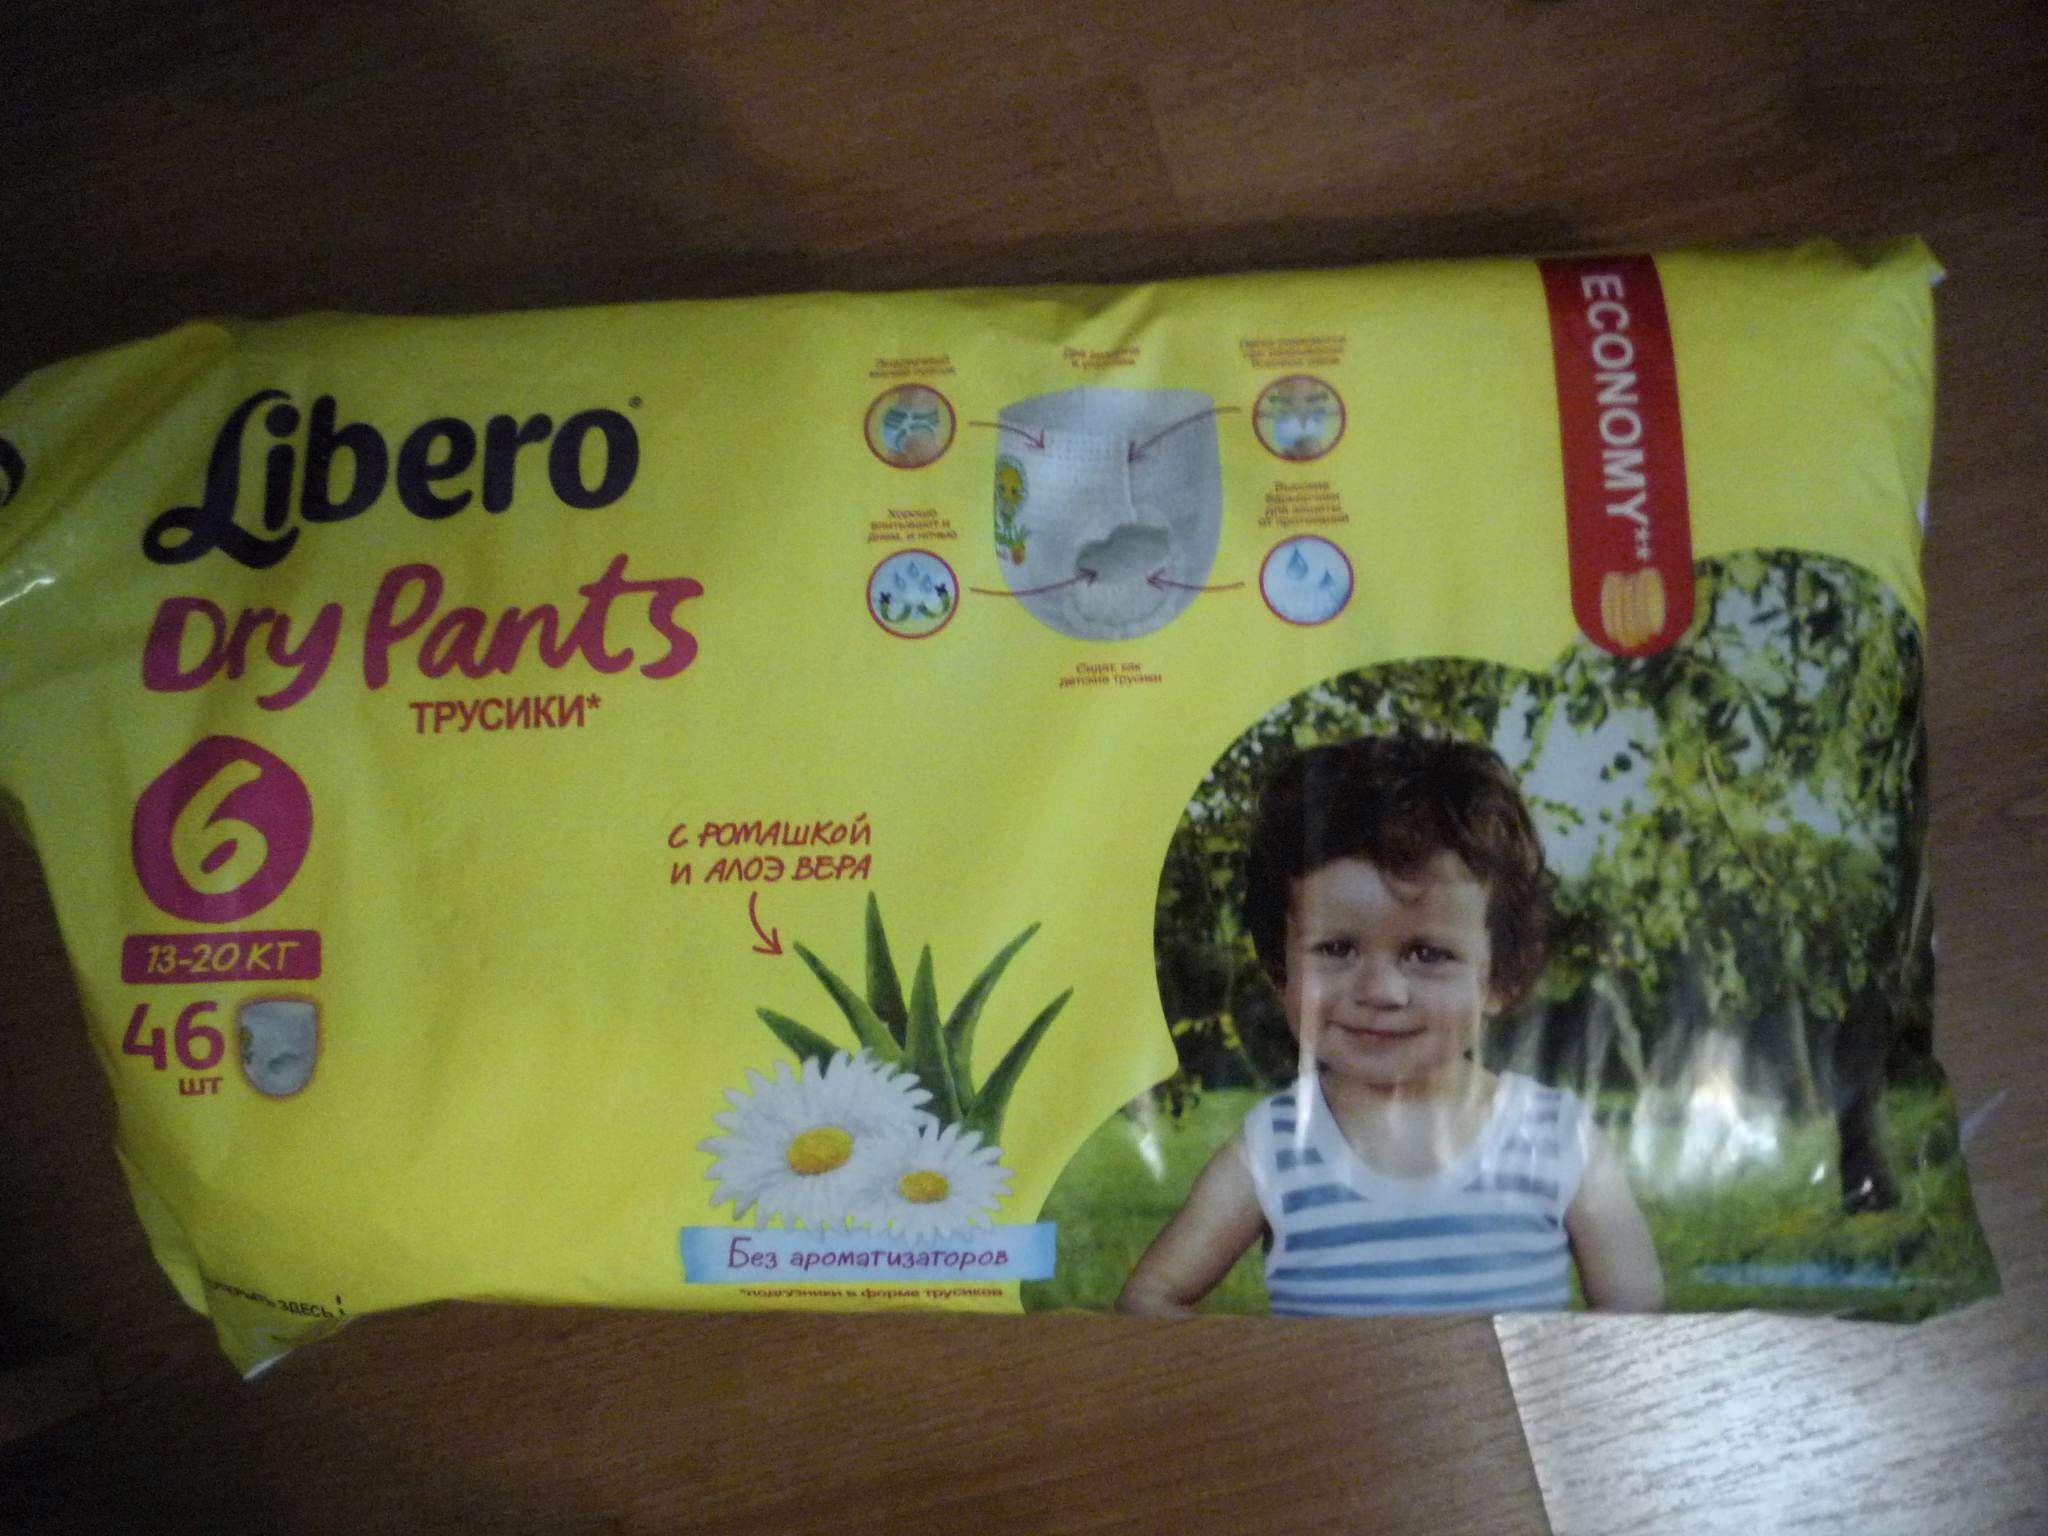 365f2b2abd02 Трусики Libero Dry Pants (Либеро Драй Пэнтс) 6 Extra Large (13-20 кг ...